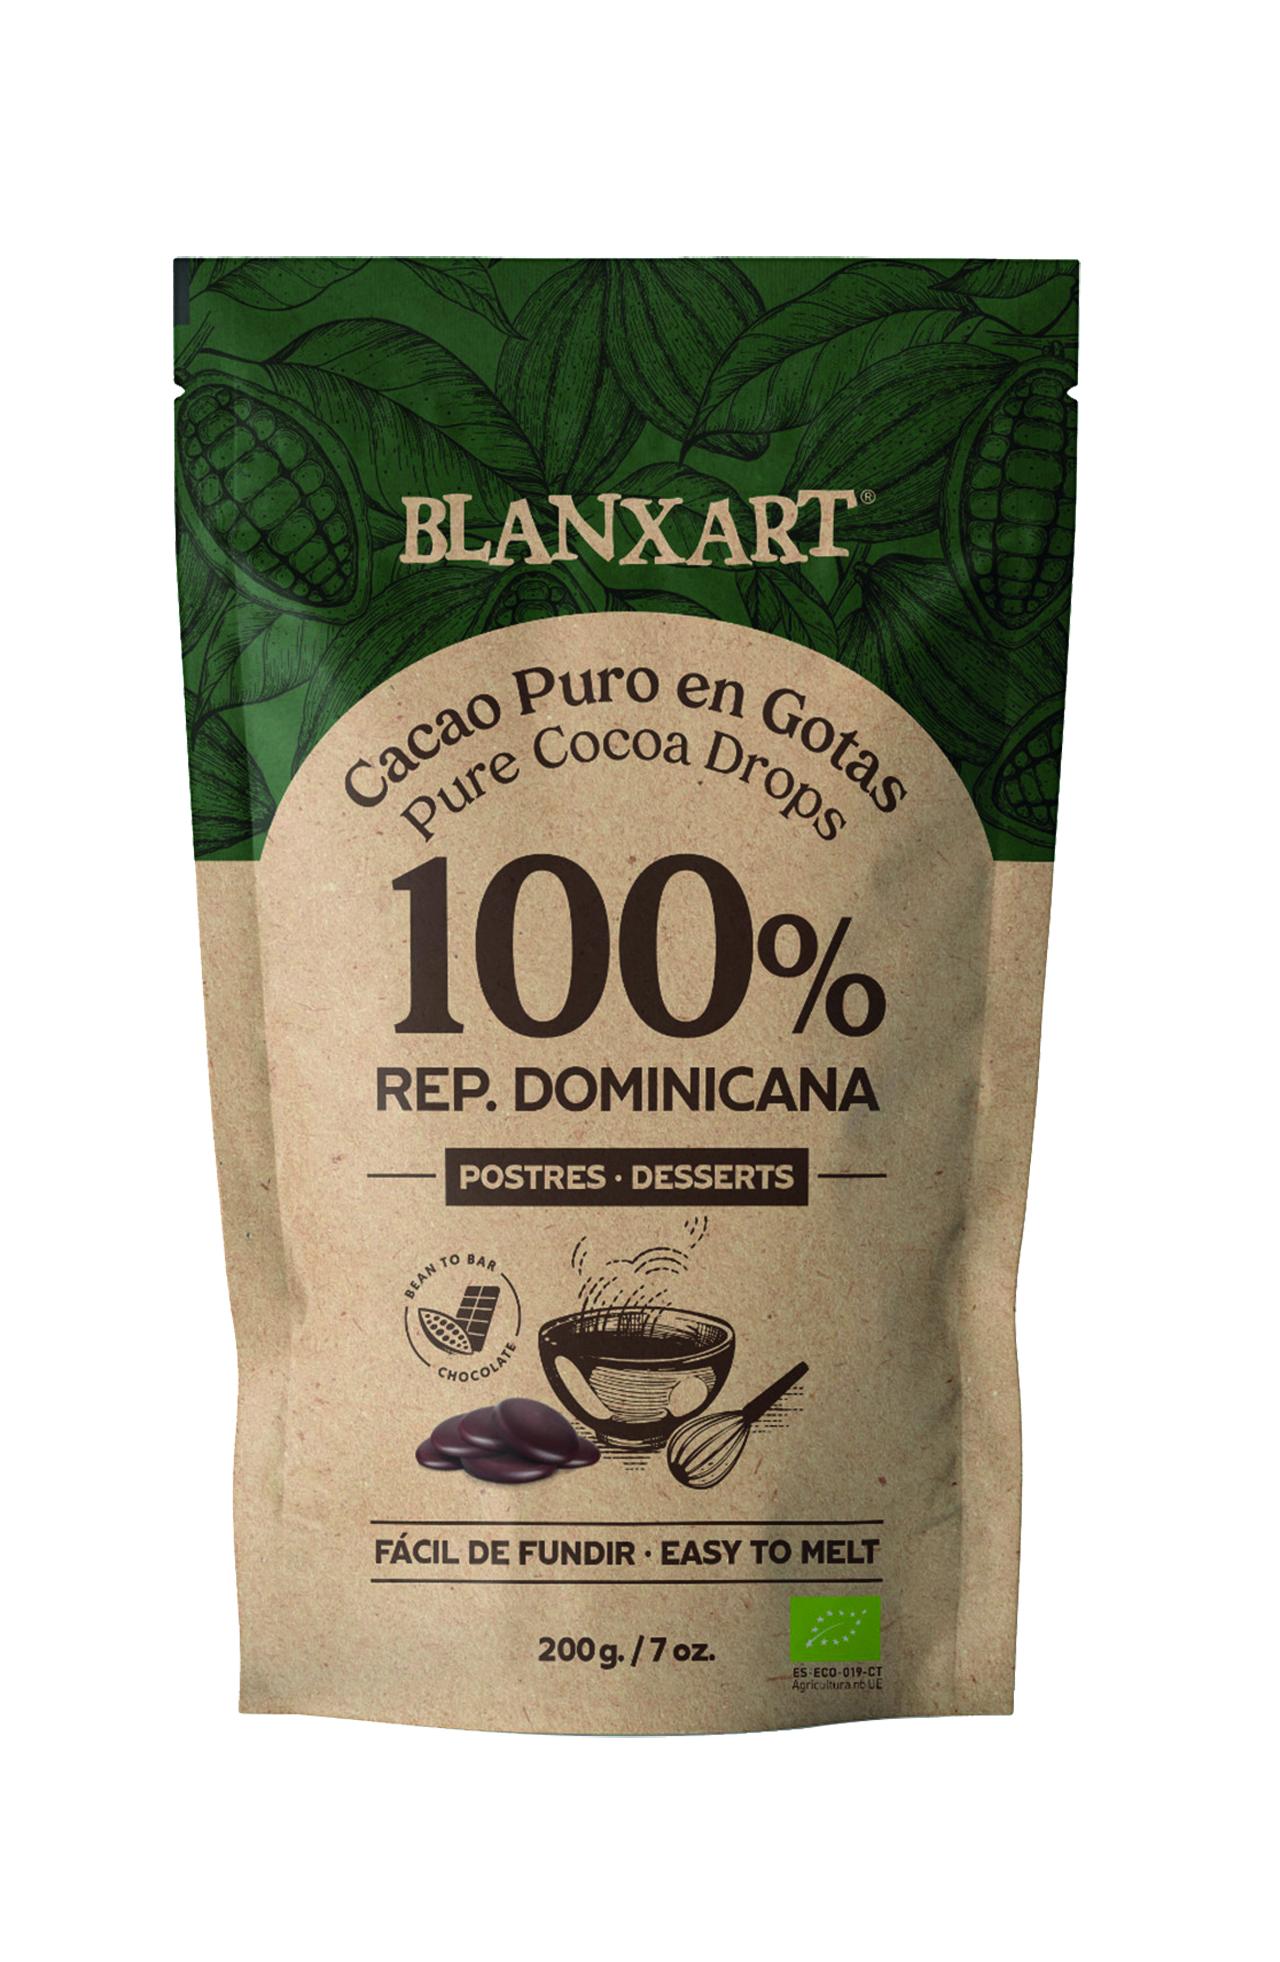 BLANXART Schokoladendrops »Rep. Dominicana« Cacao Puro 100%